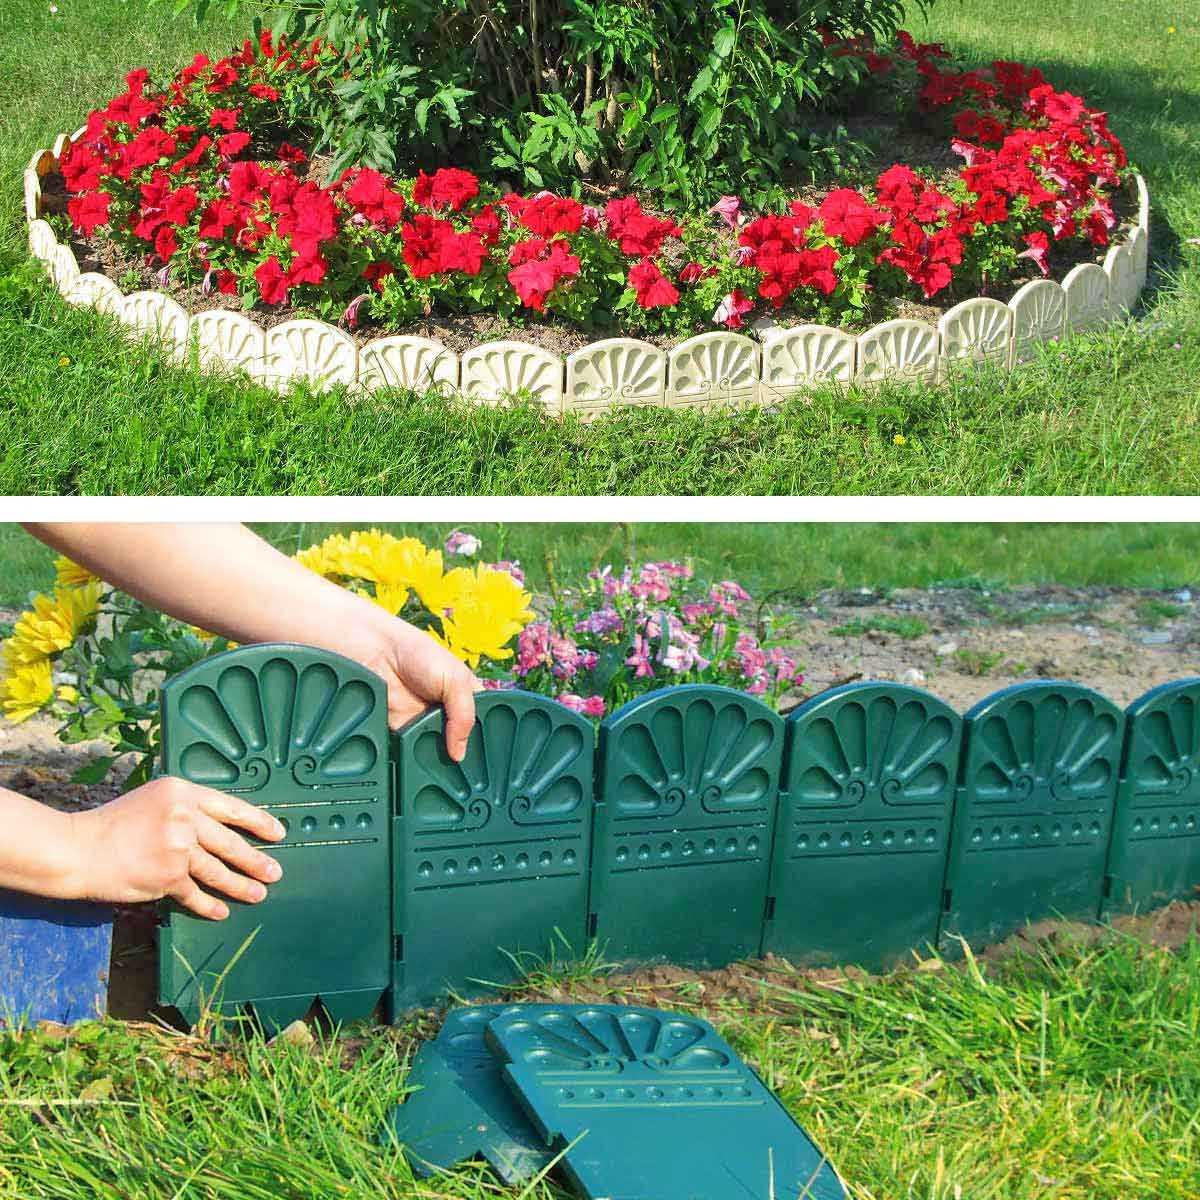 Bordures Décoratives De Jardin En Plastique concernant Bordure Jardin Flexible